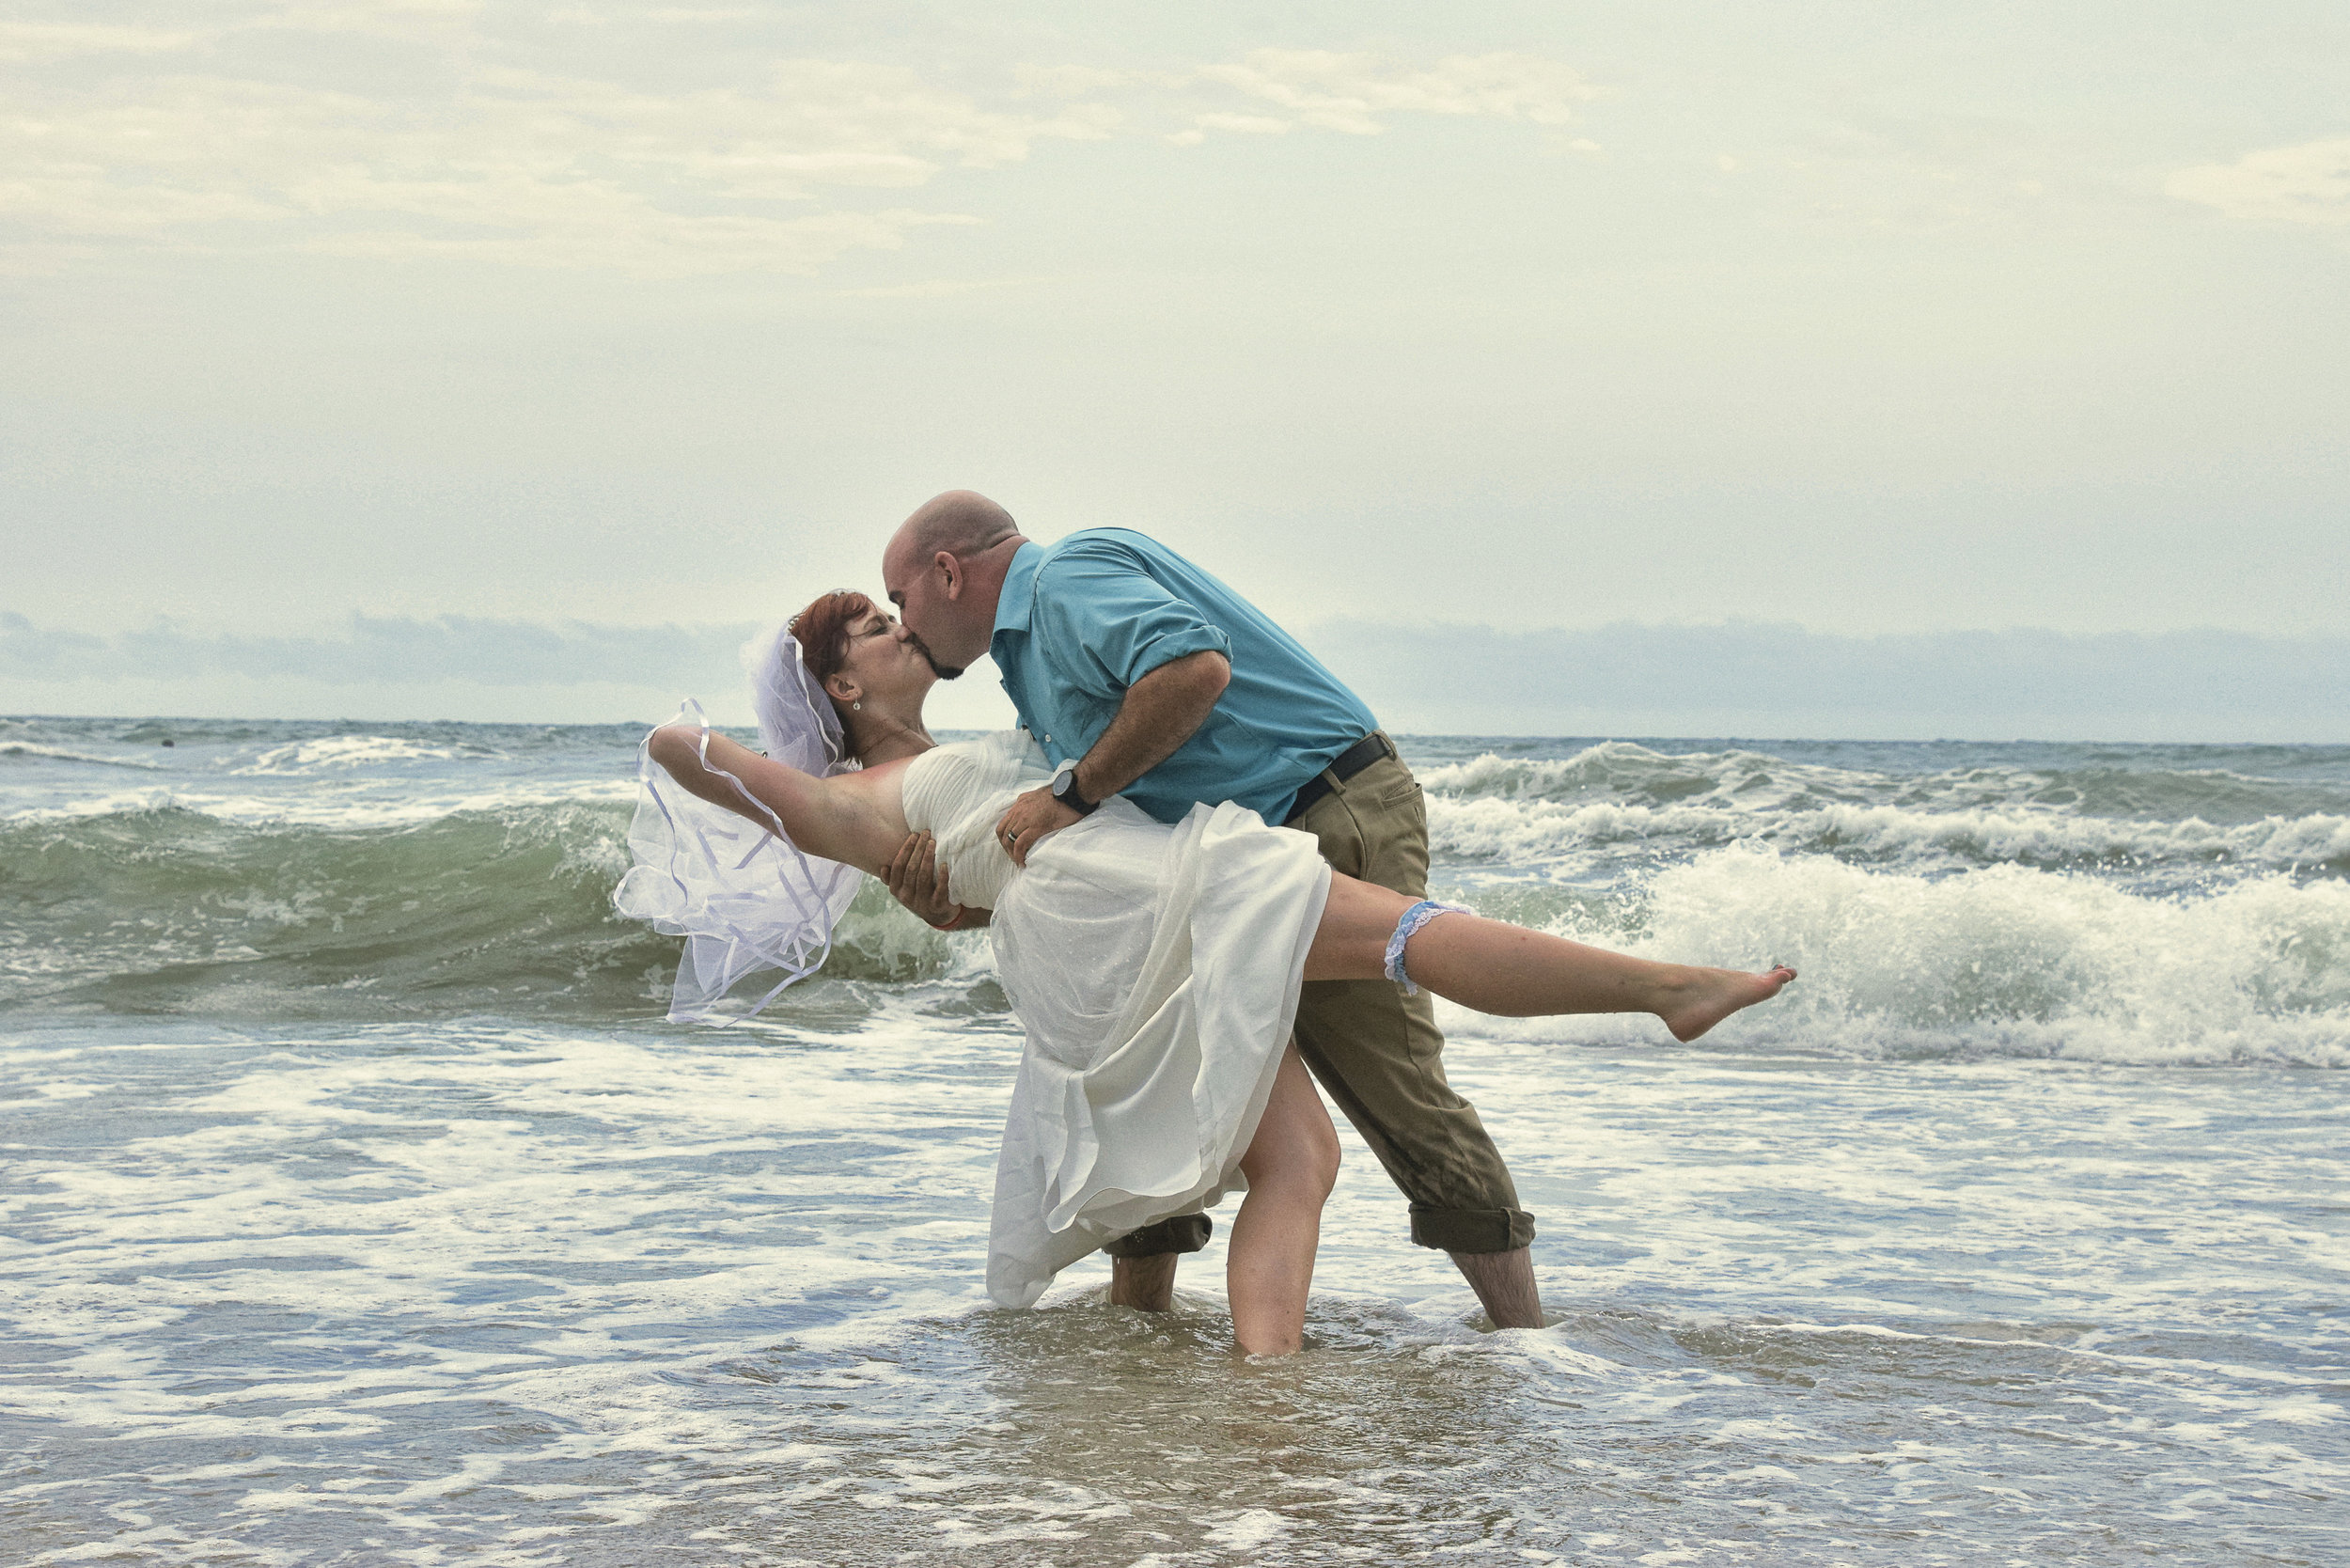 Groom dips his bride while standing in the ocean.